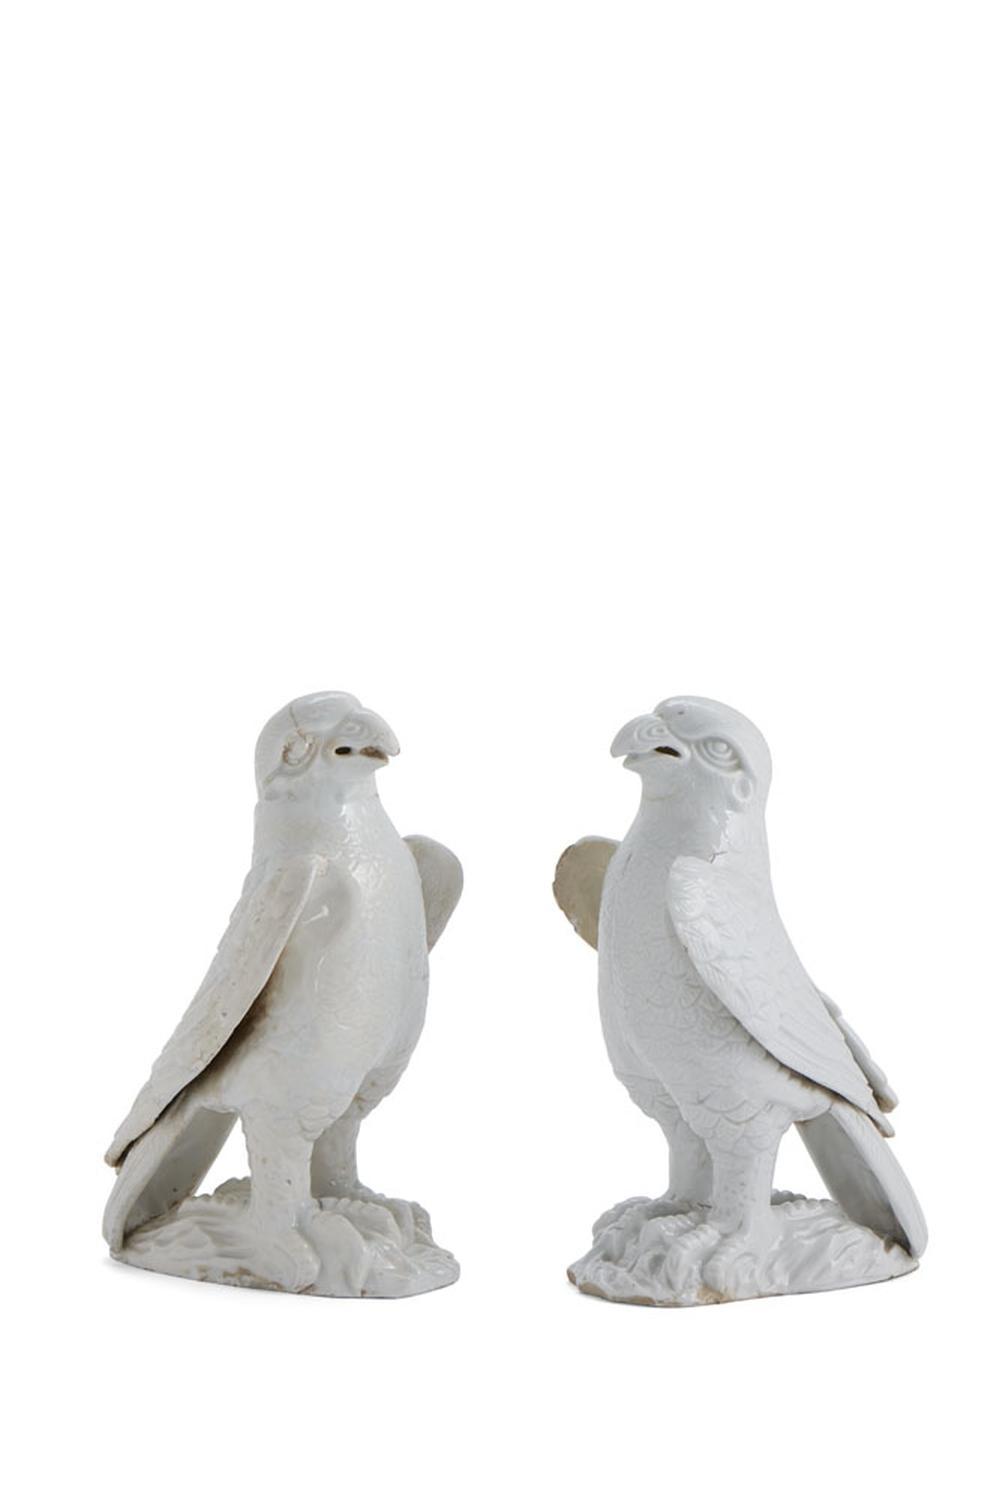 Par de falcões, esculturas porcelana chinesa(2)